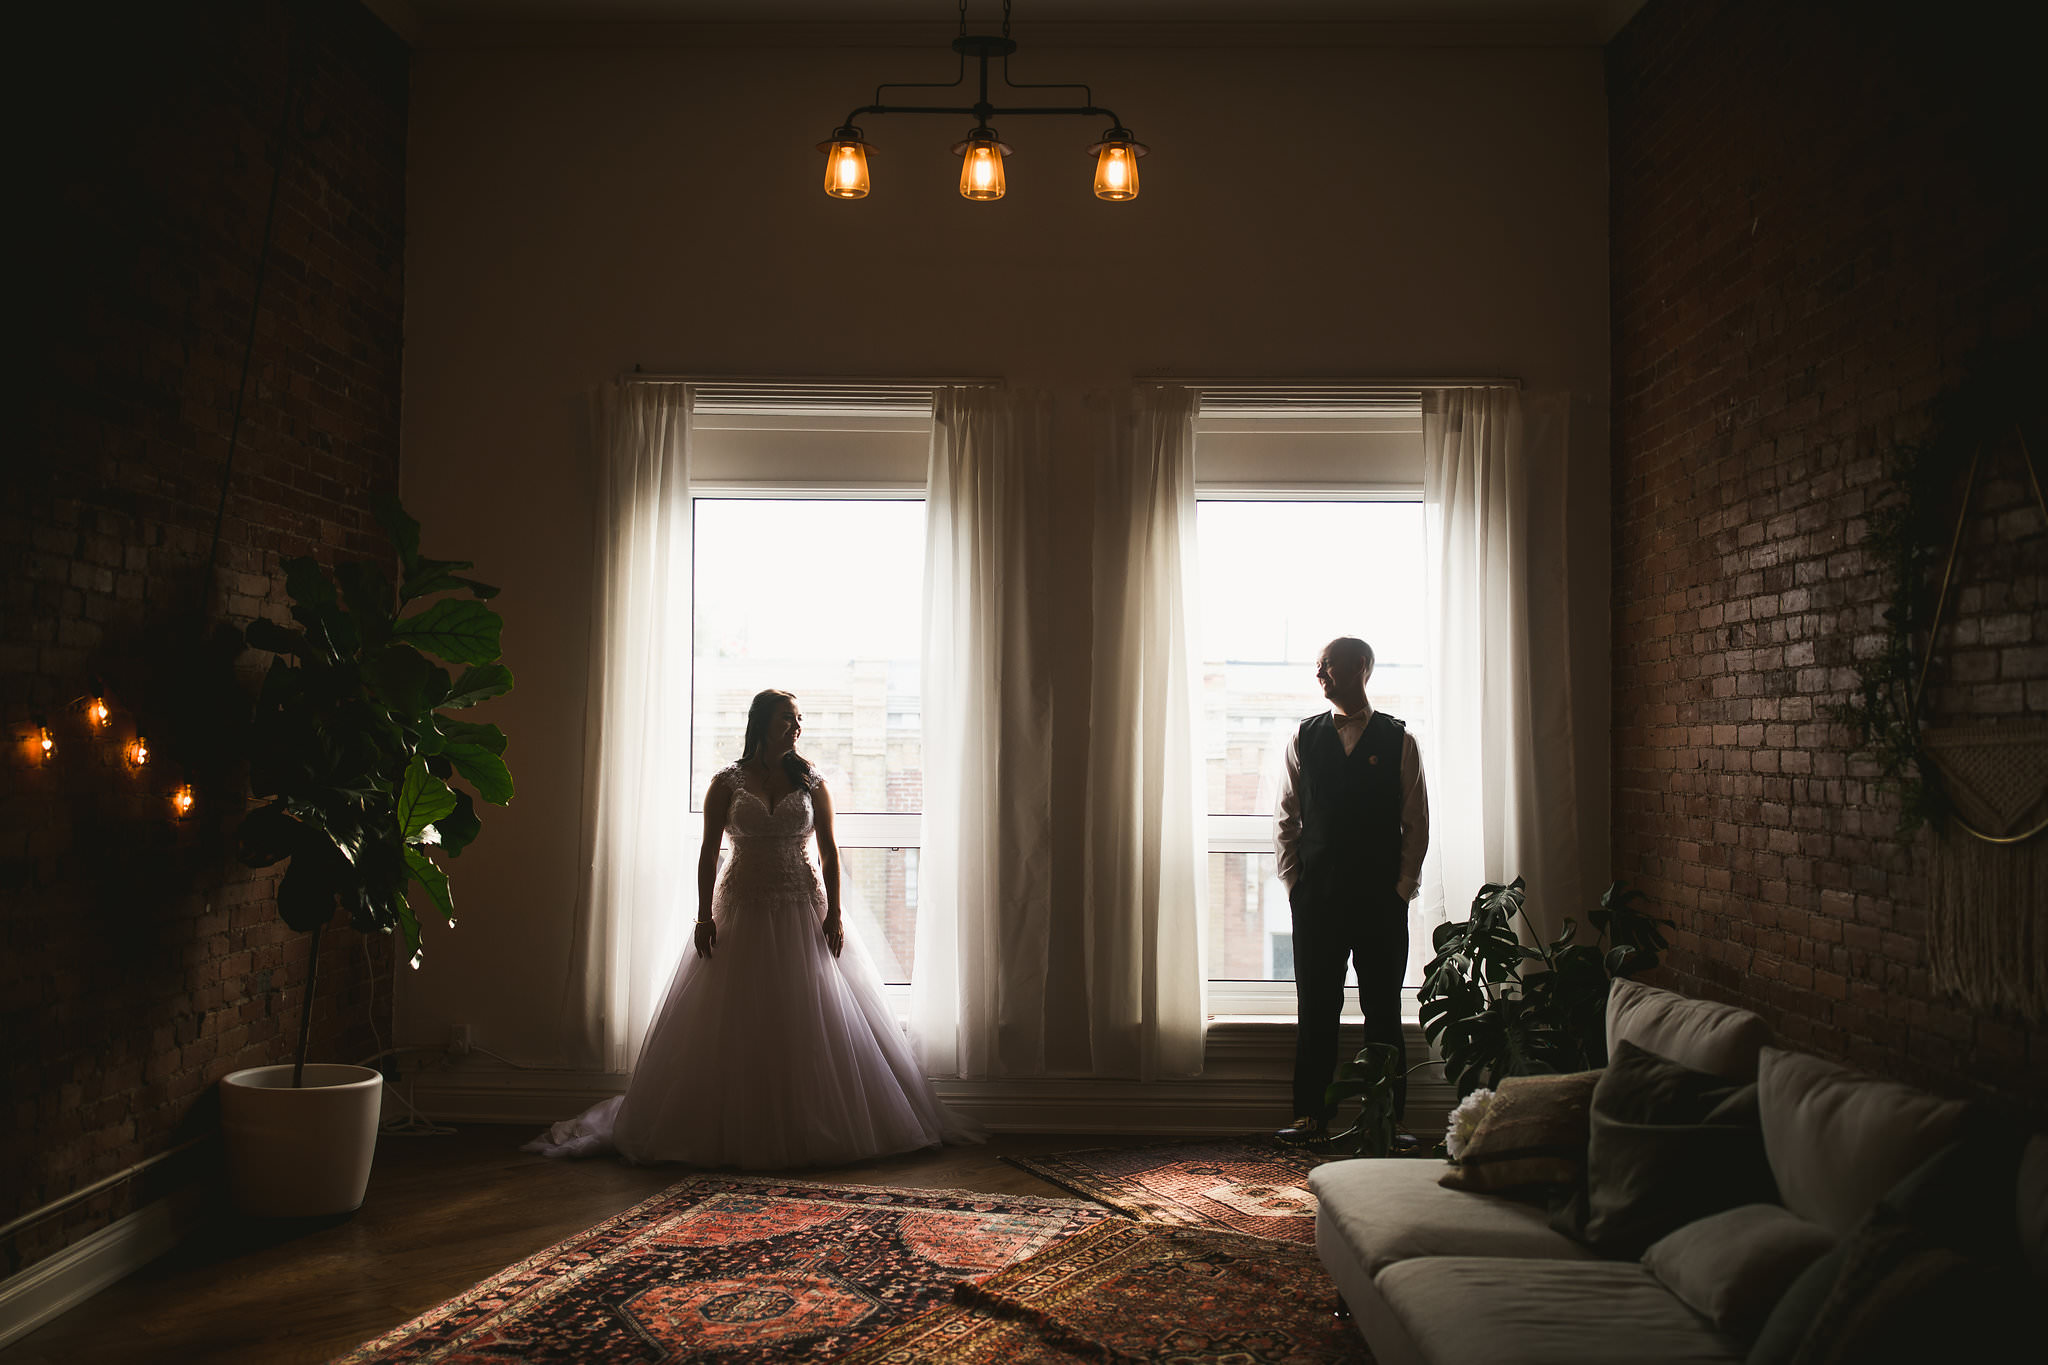 Kristen Adam Kindred Loft Whitby Wedding Photos 347 - Durham Wedding Photographer: Kindred Loft Wedding Photos